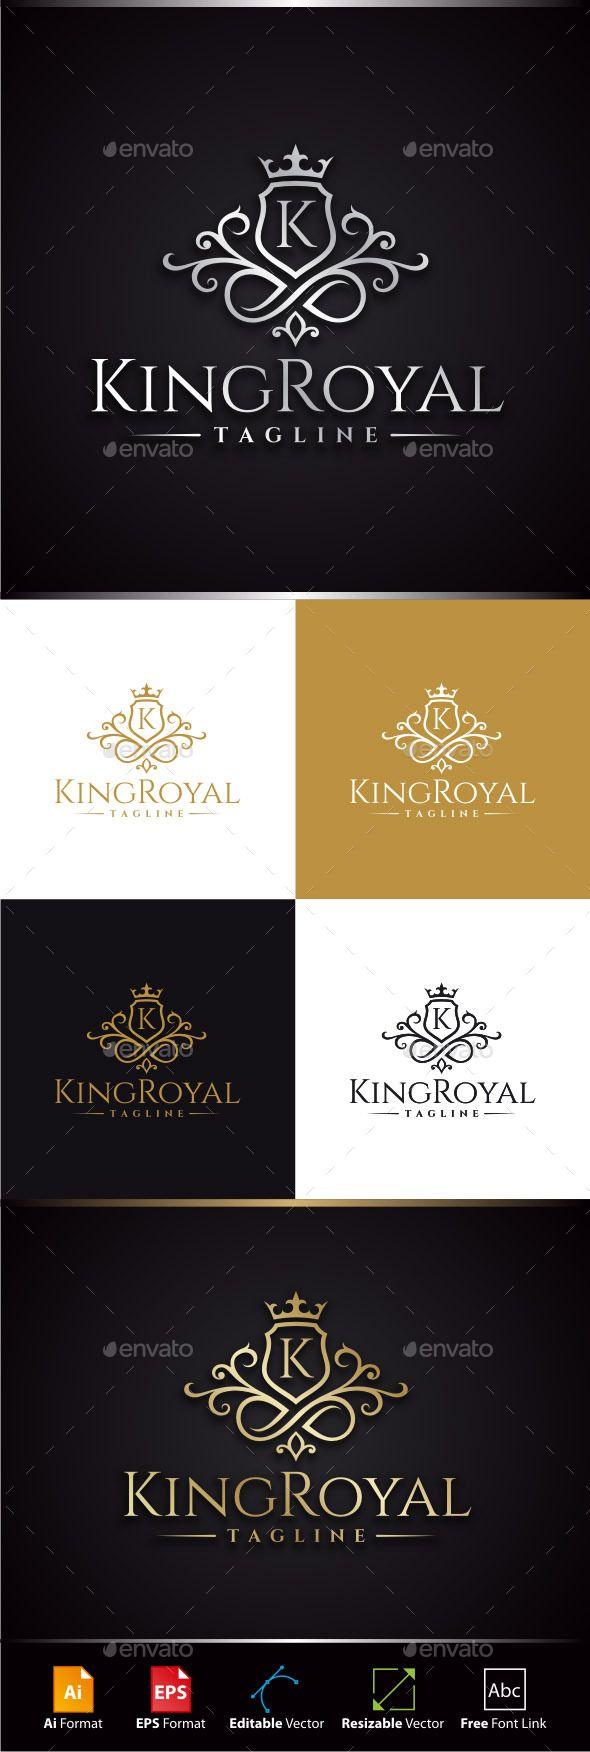 King Royal Logo Template #design #logo Download: http://graphicriver.net/item/king-royal-logo/11446600?ref=ksioks